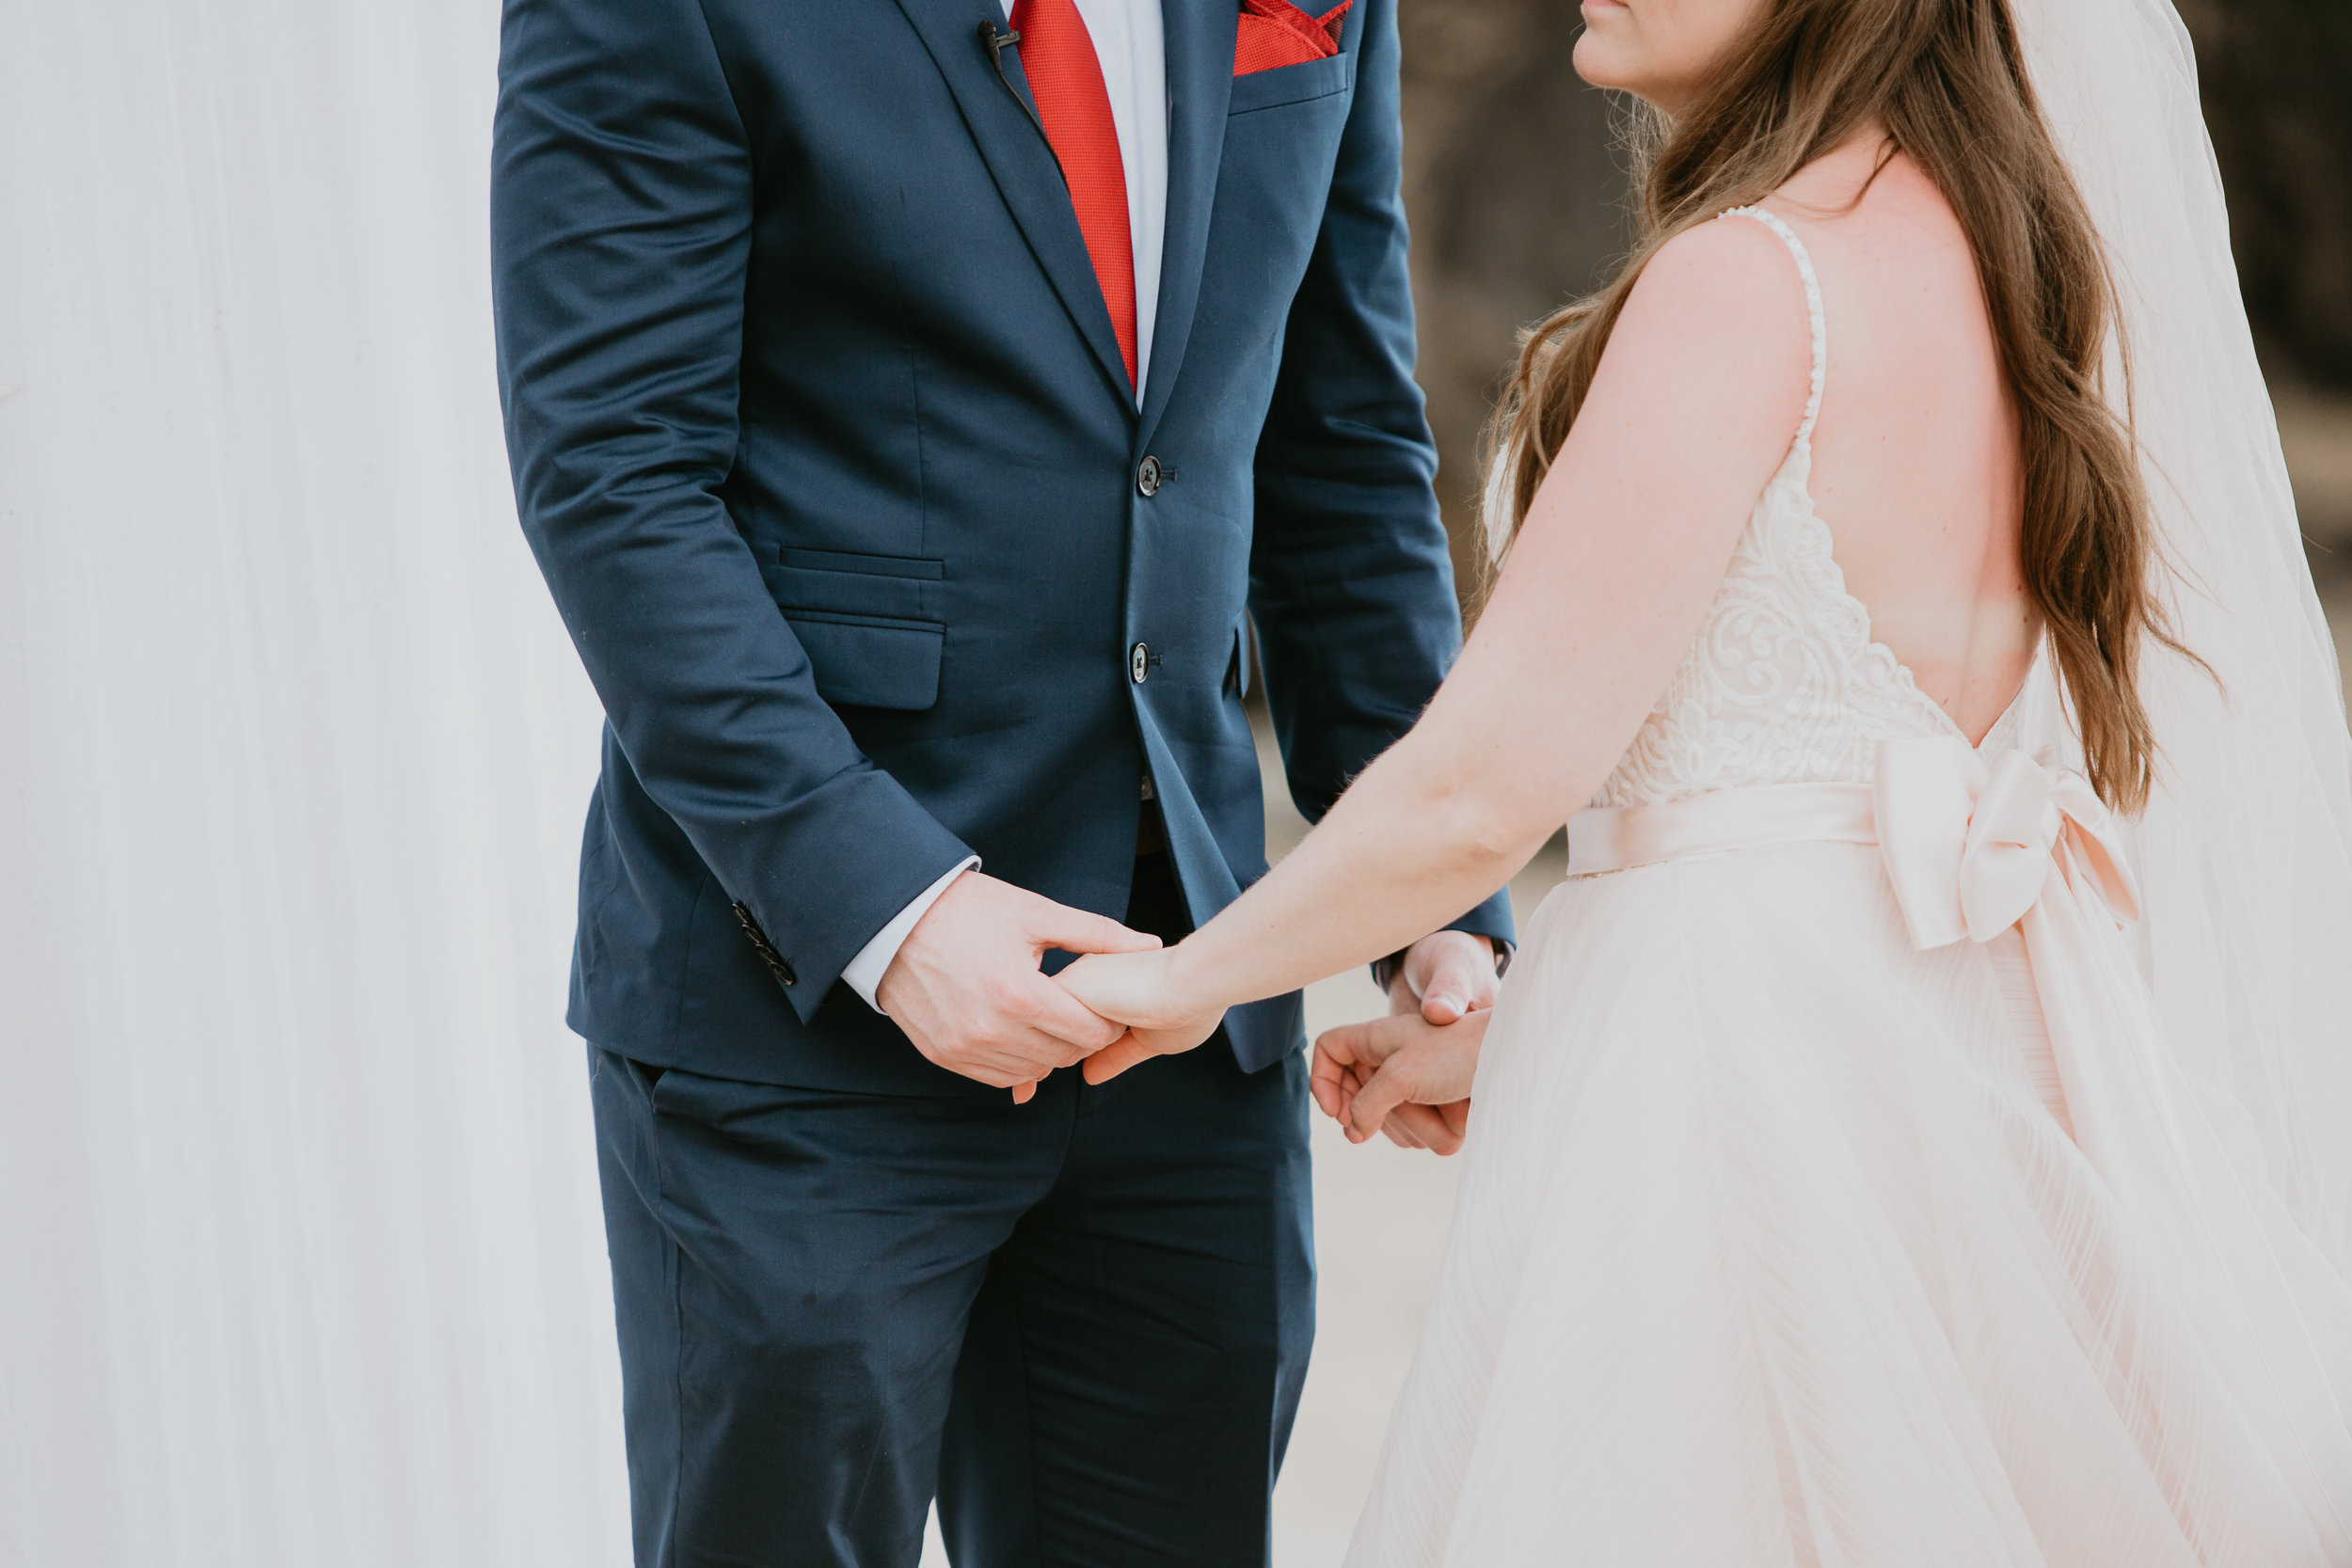 nicole-daacke-photography-destination-wedding-in-st-lucia-sandals-la-toc-intimate-island-wedding-carribean-elopement-photographer-chill-island-wedding-60.jpg